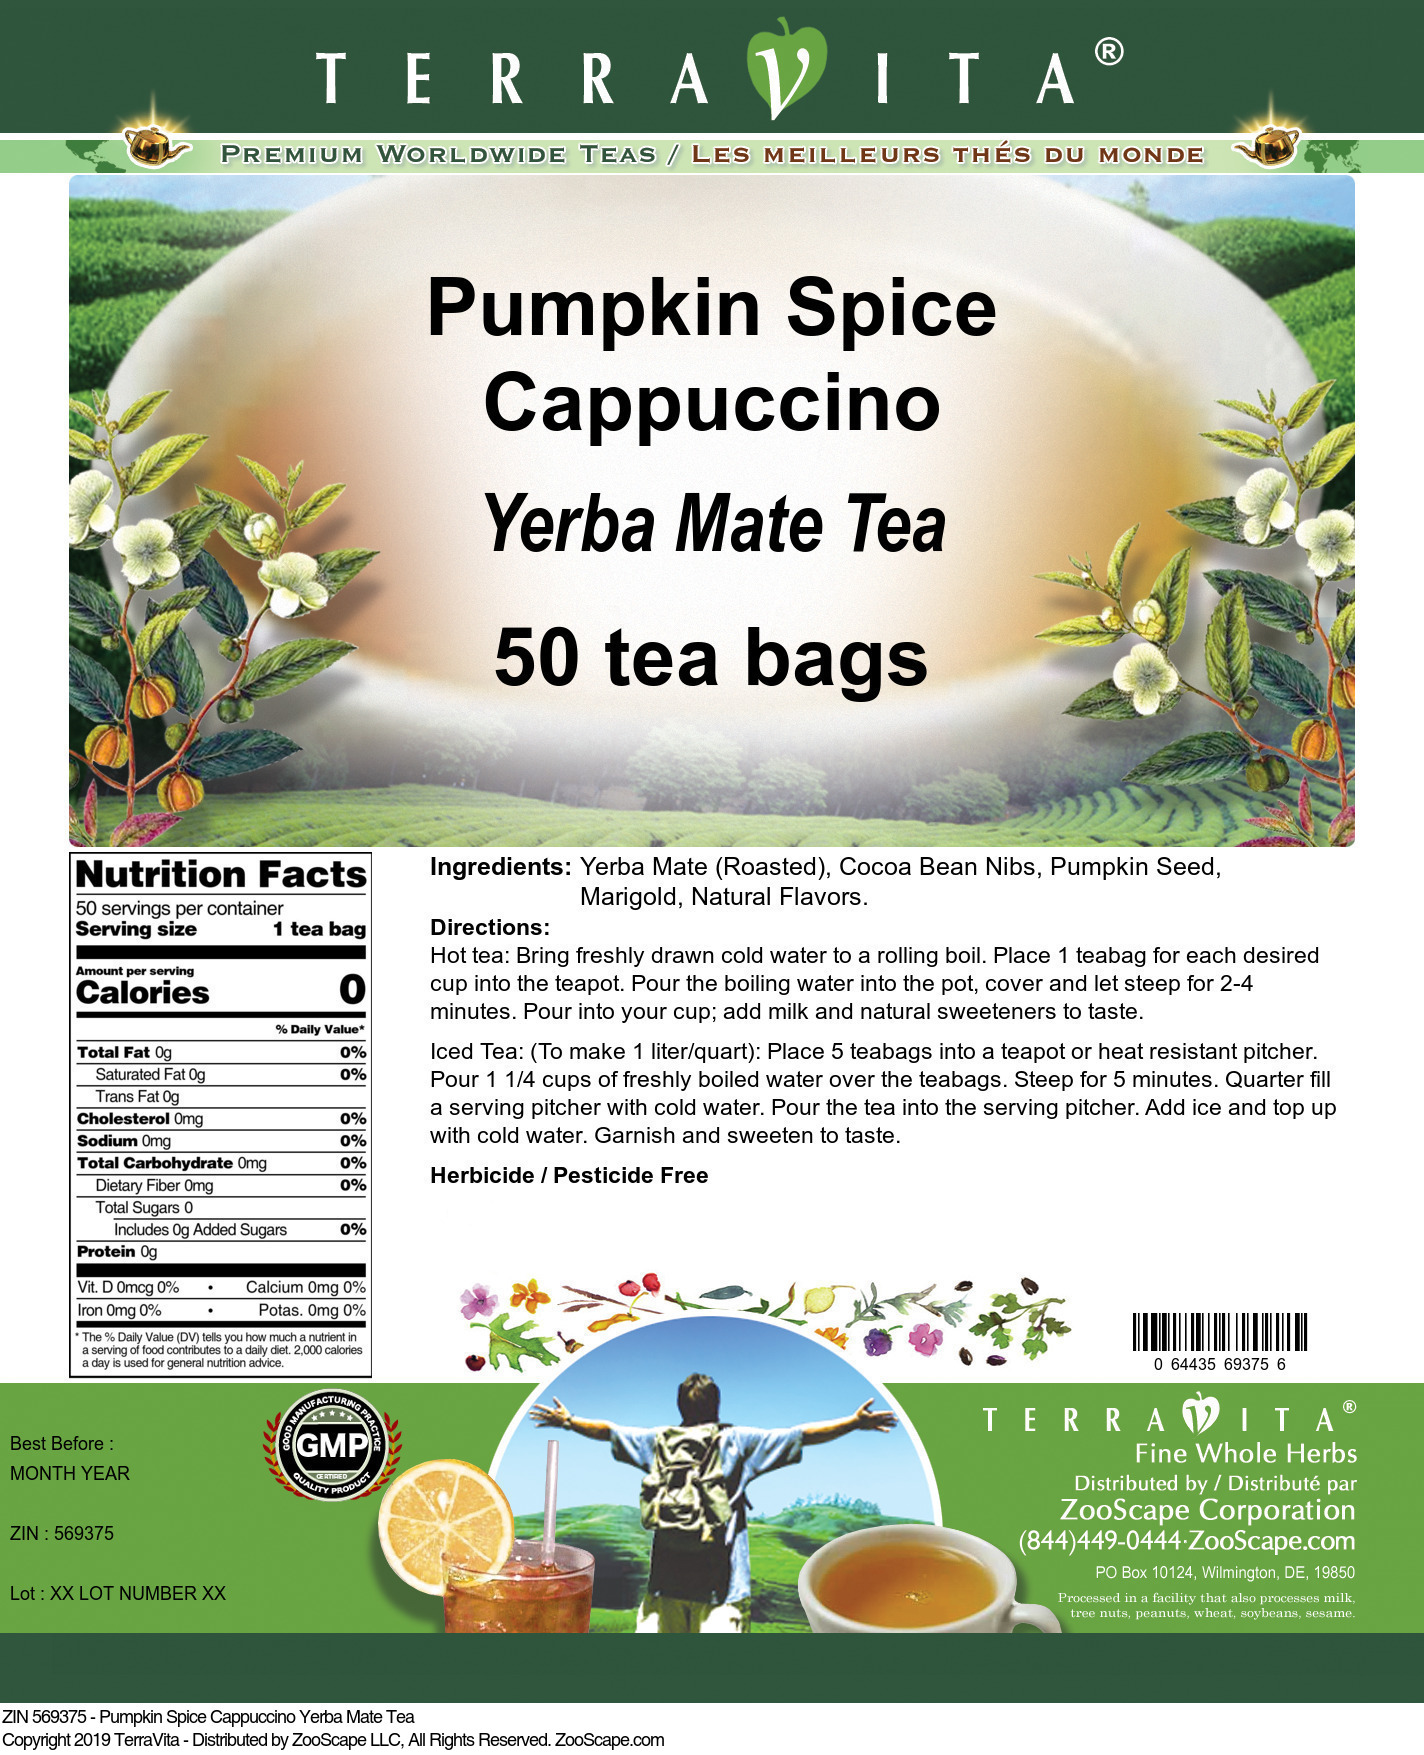 Pumpkin Spice Cappuccino Yerba Mate Tea